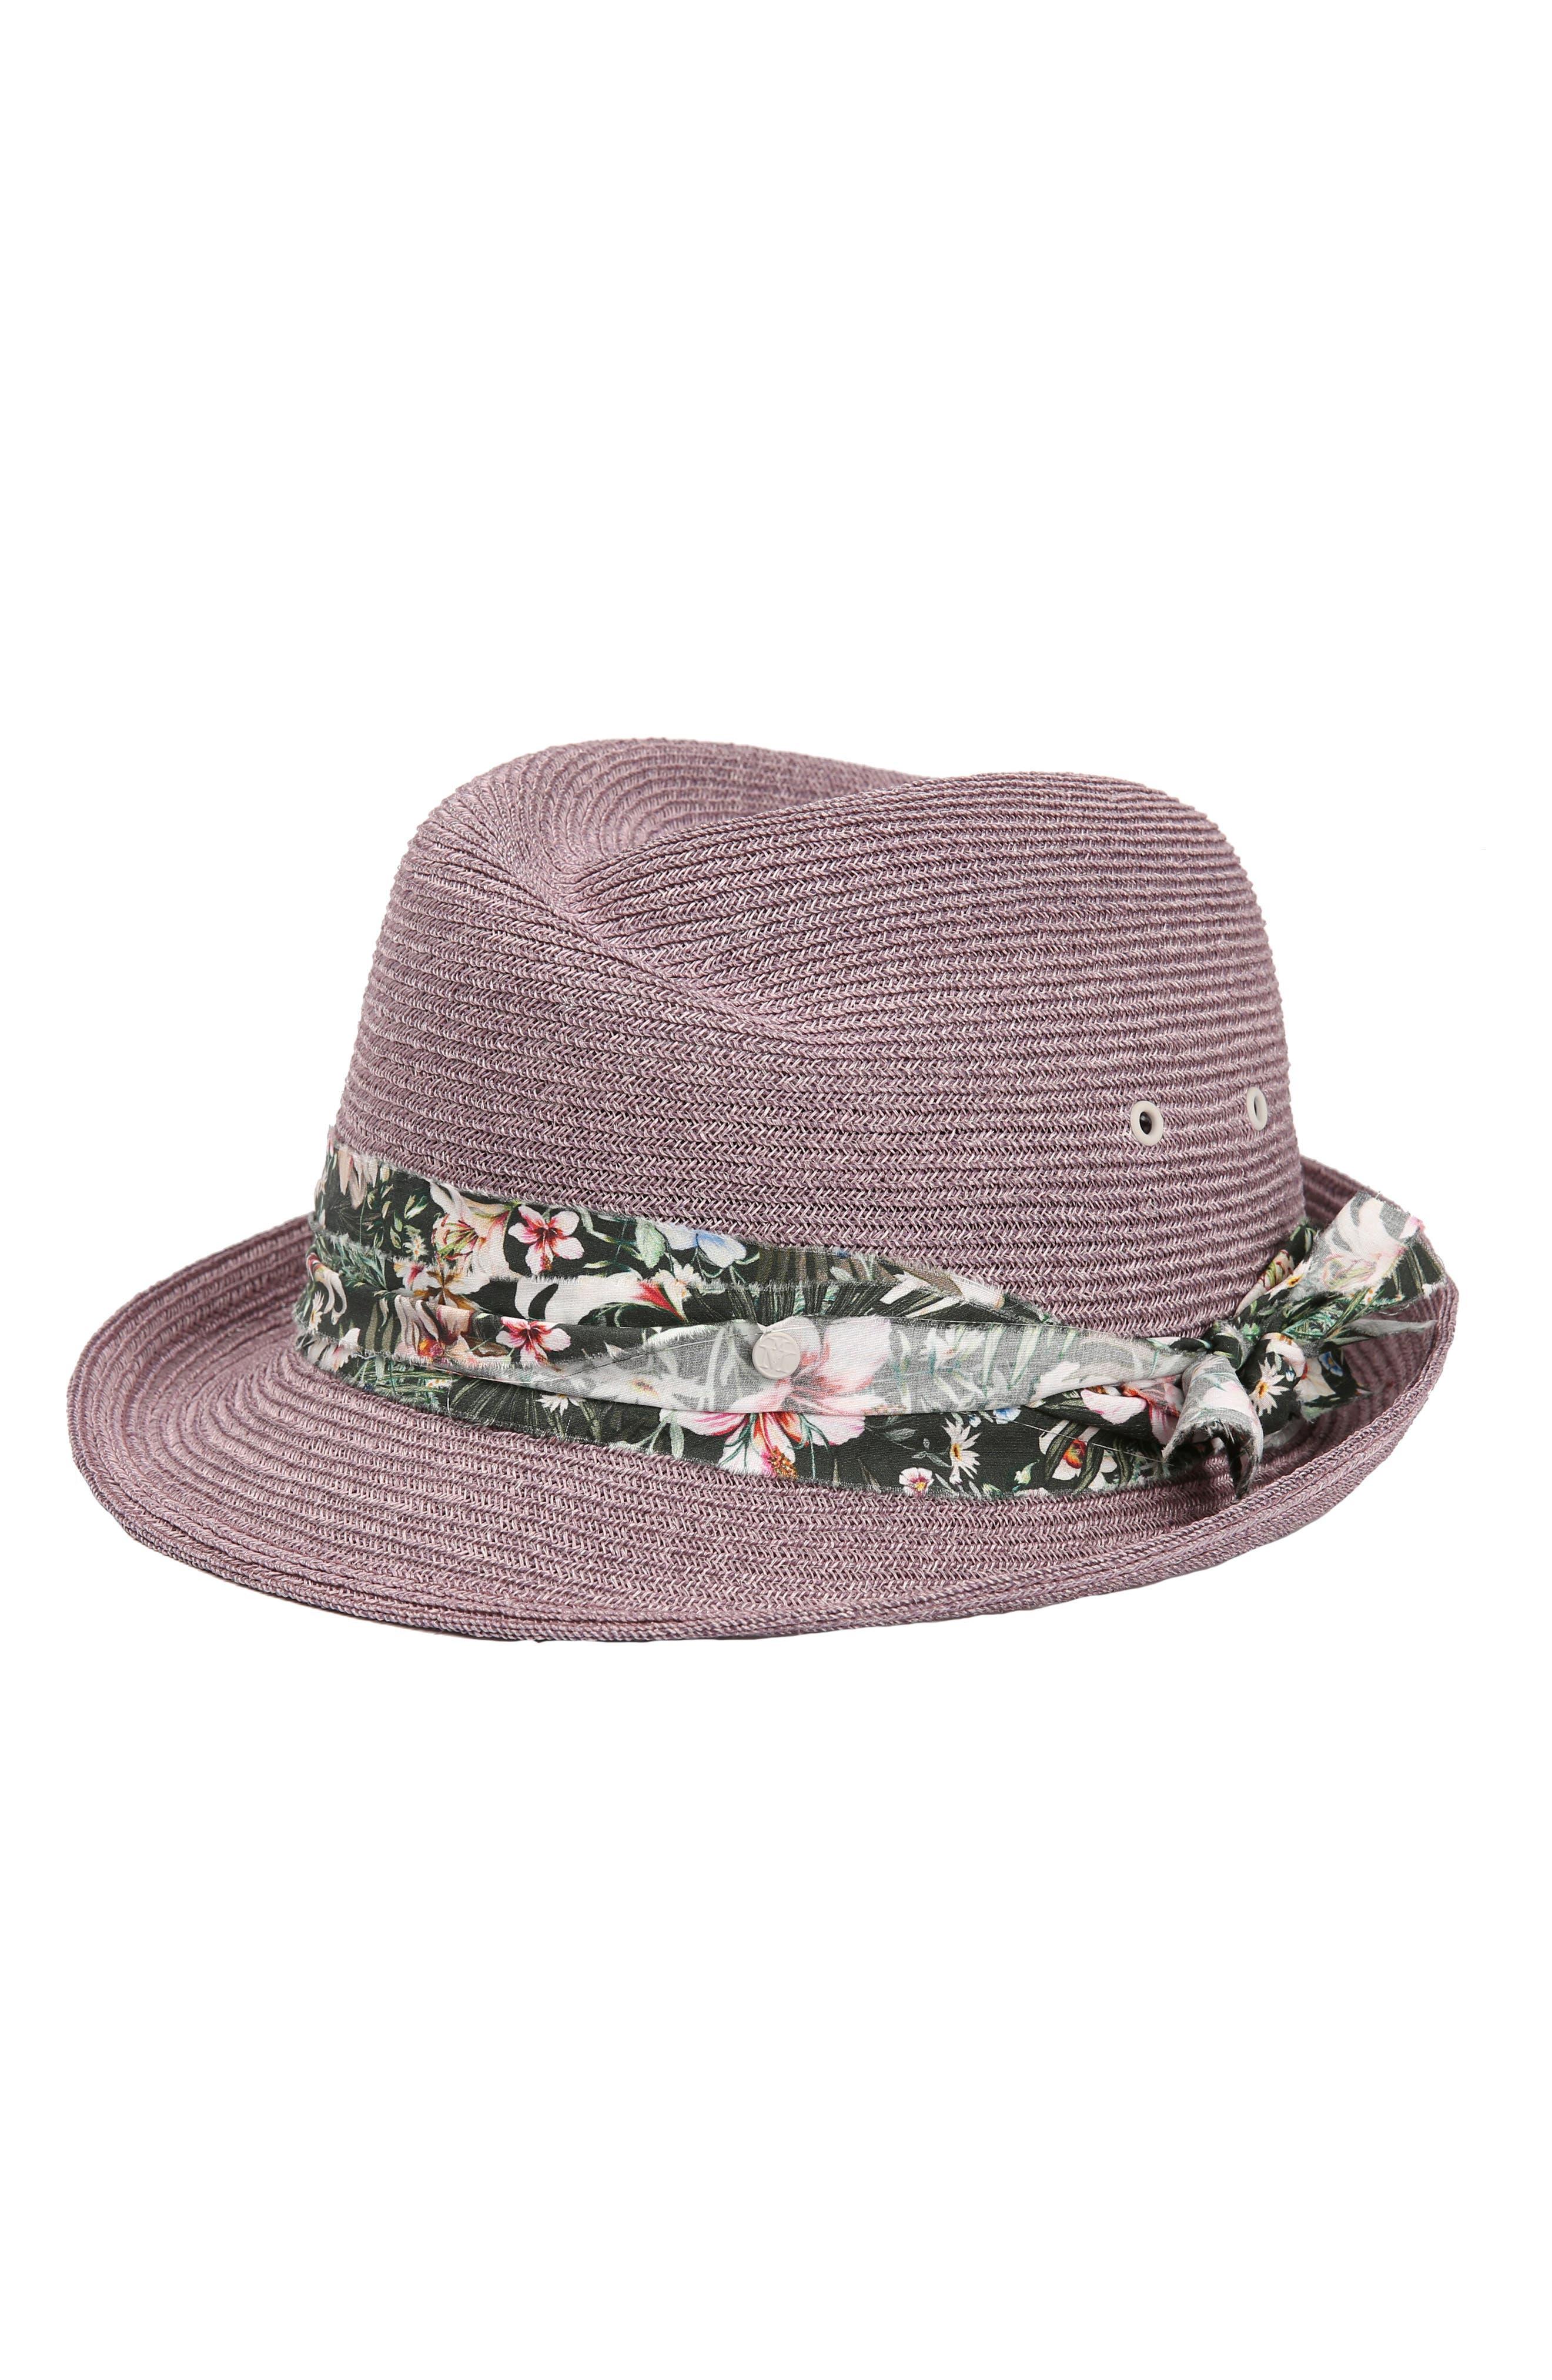 Virginie Up Straw Hat,                         Main,                         color, Lavender